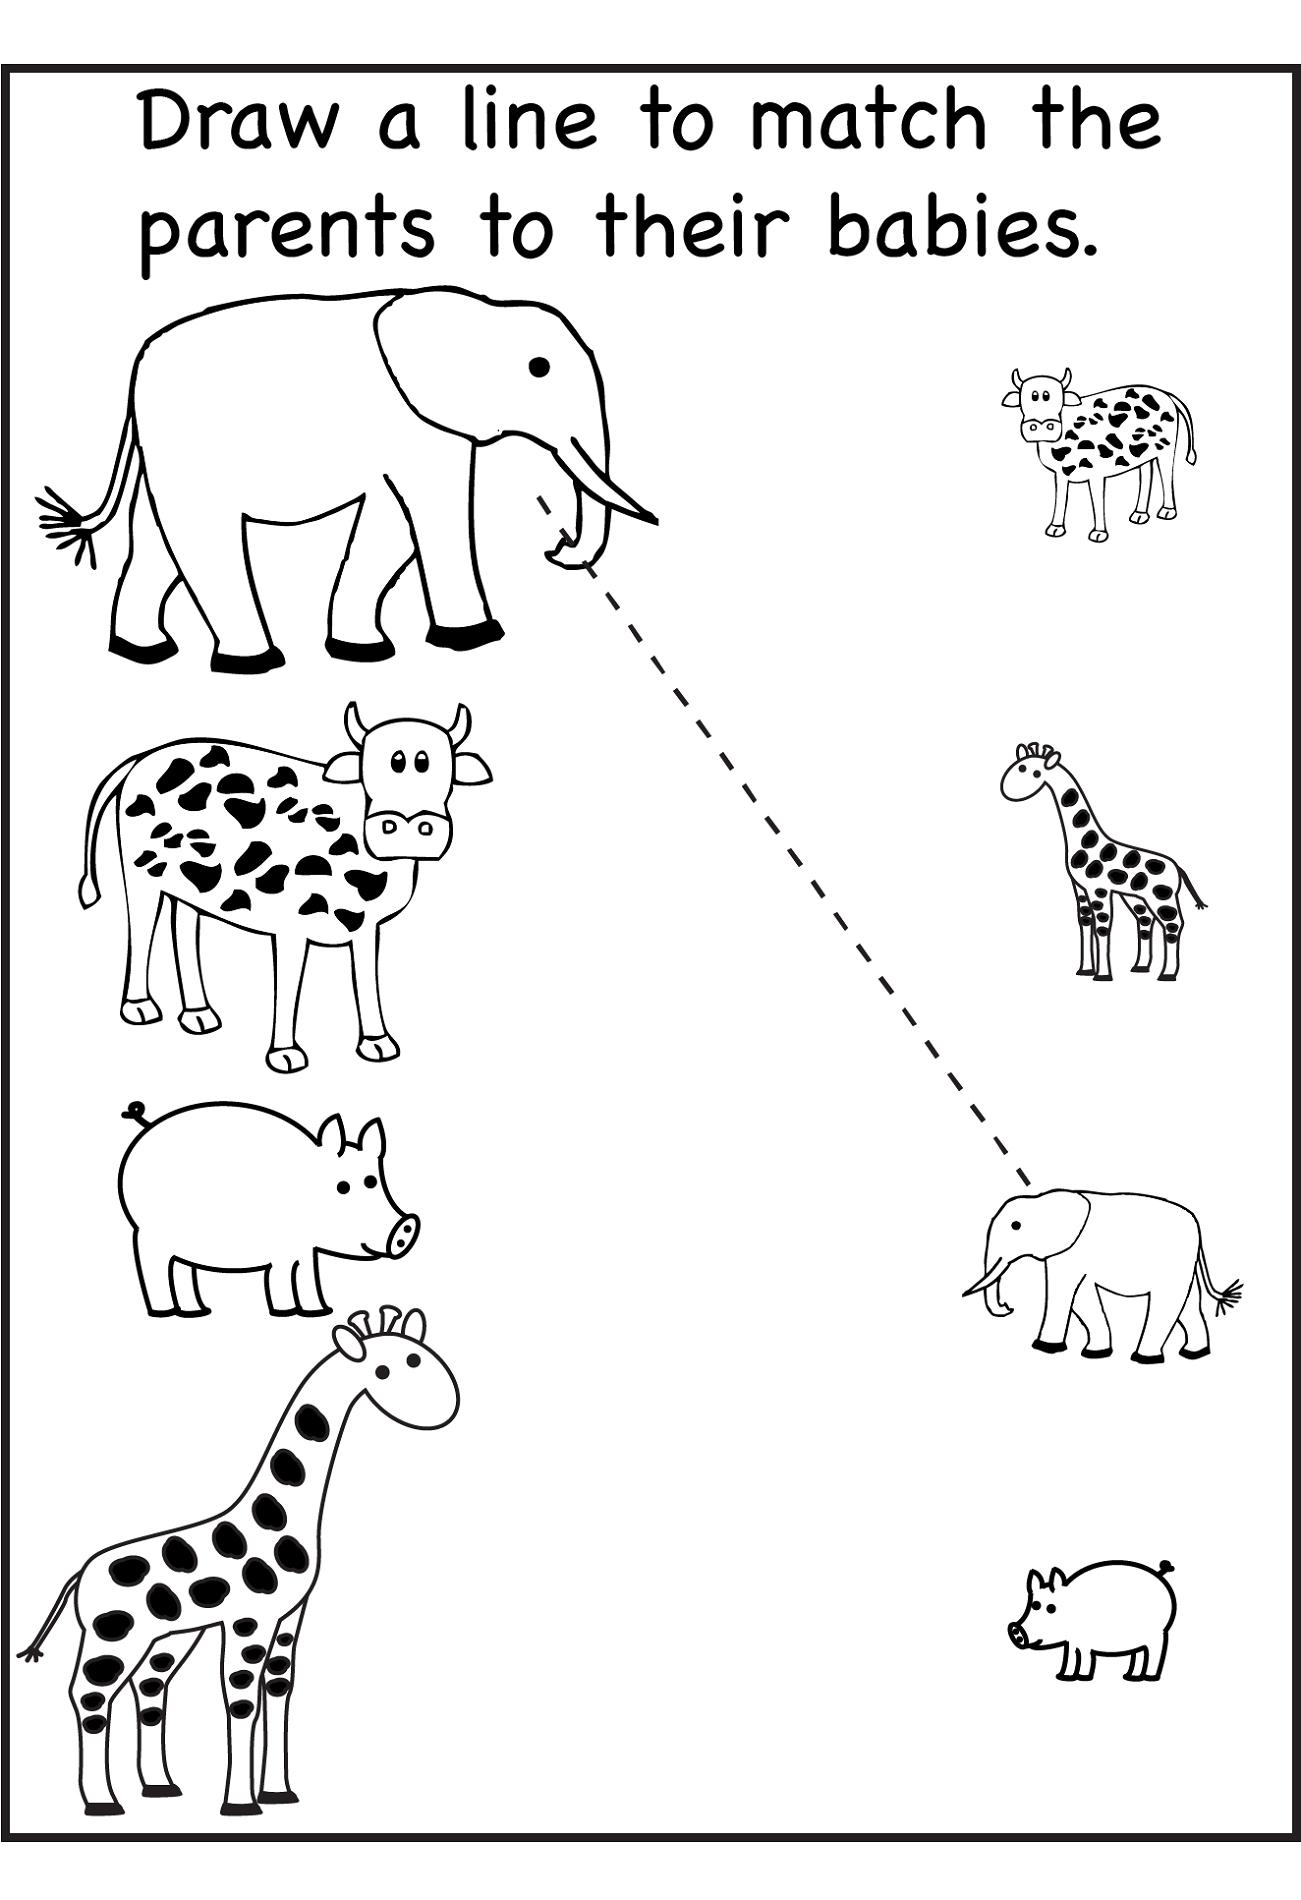 Free Preschool Worksheets Age 3 – With Printable Also 4 Worksheet   Free Printable Worksheets For 3 Year Olds